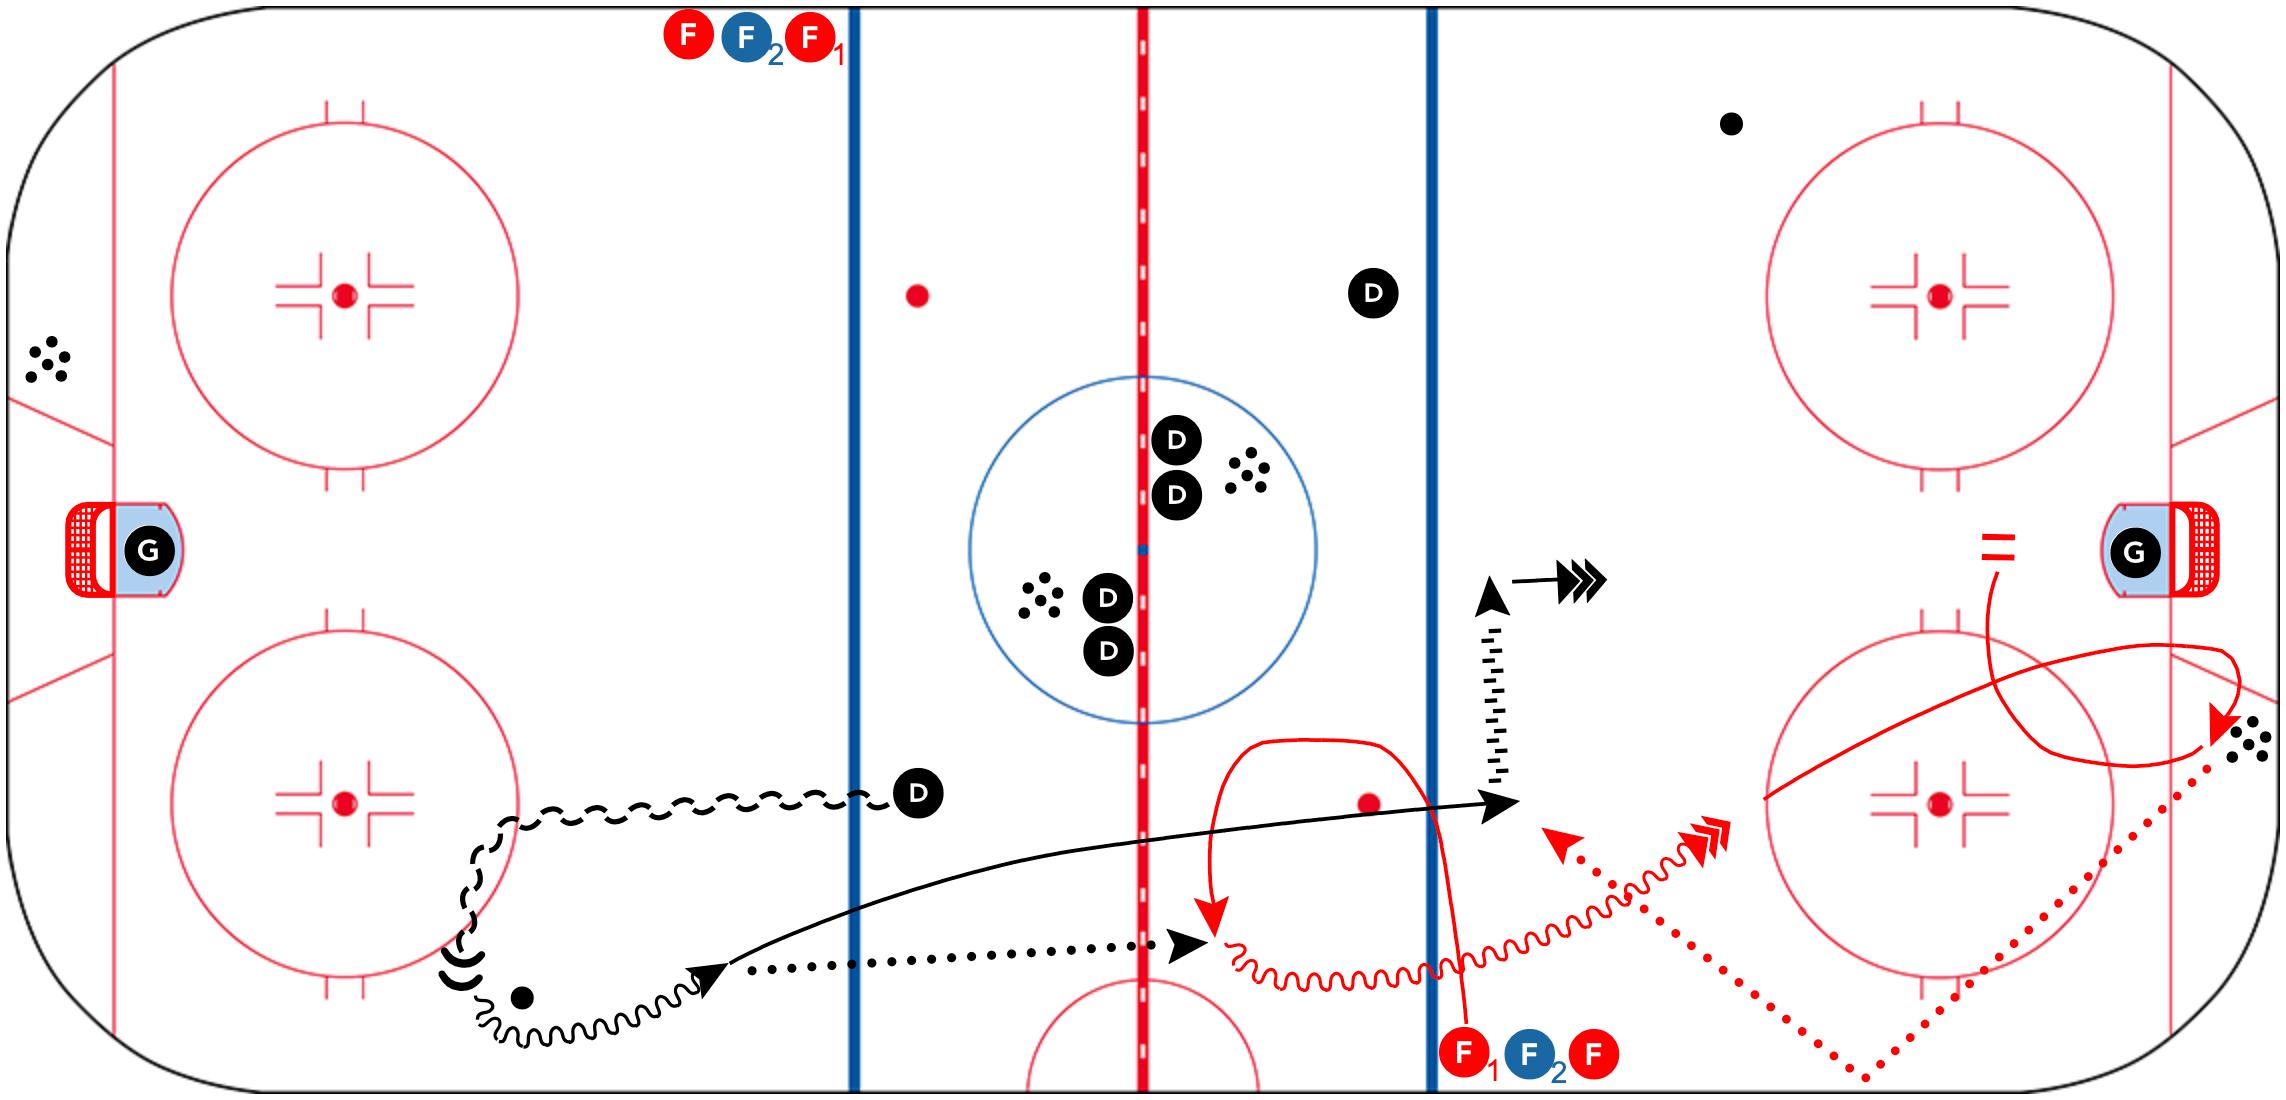 Jon-Goyens-D-Up-Basic-Transition-Drill-CoachThem